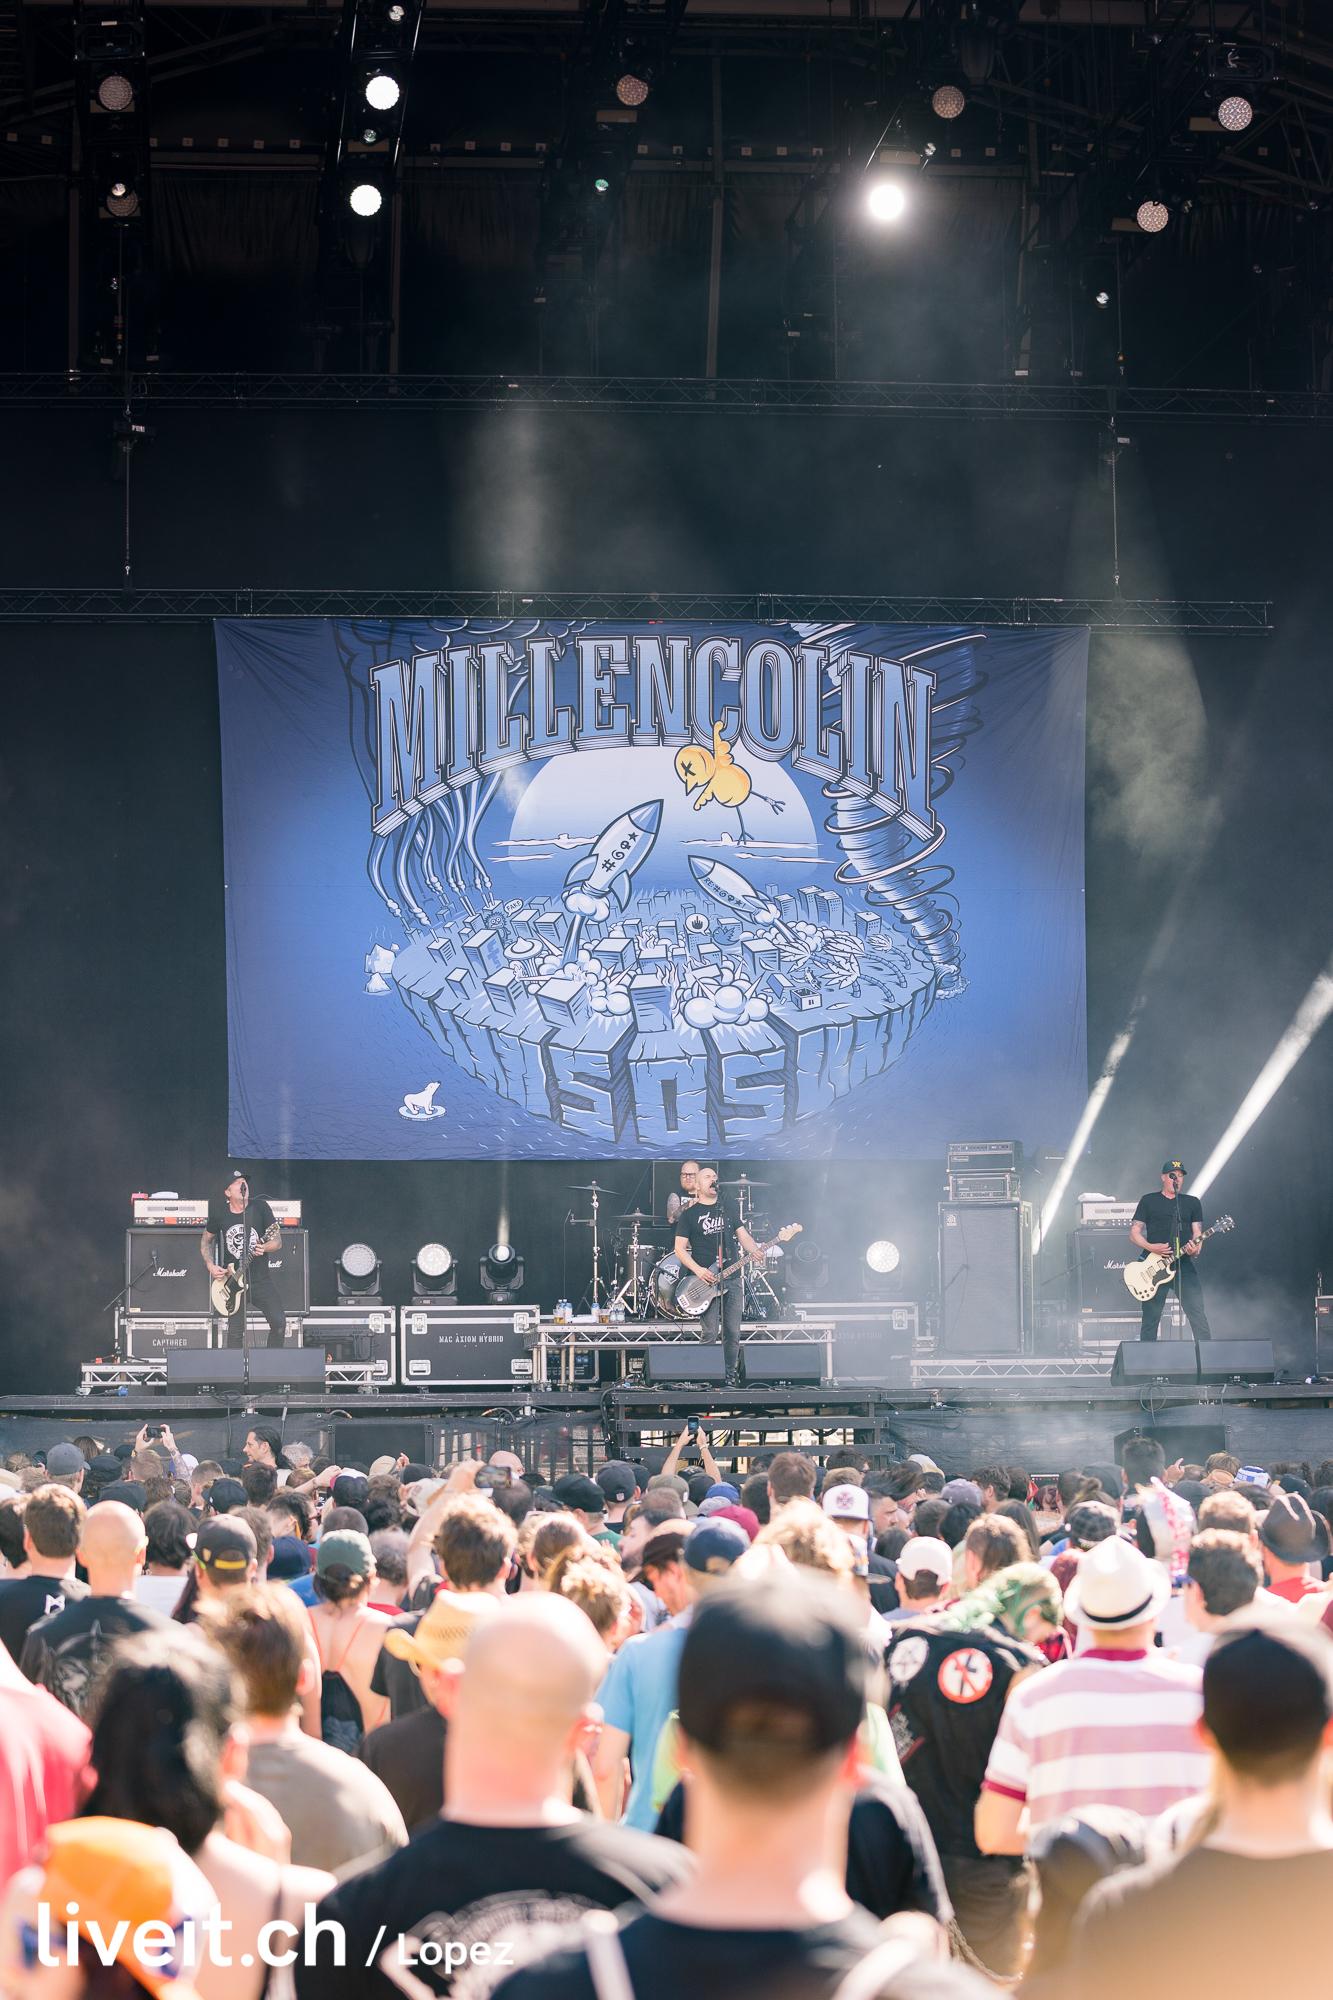 SCHWEIZ GREENFIELD FESTIVAL 2019 Millencolin